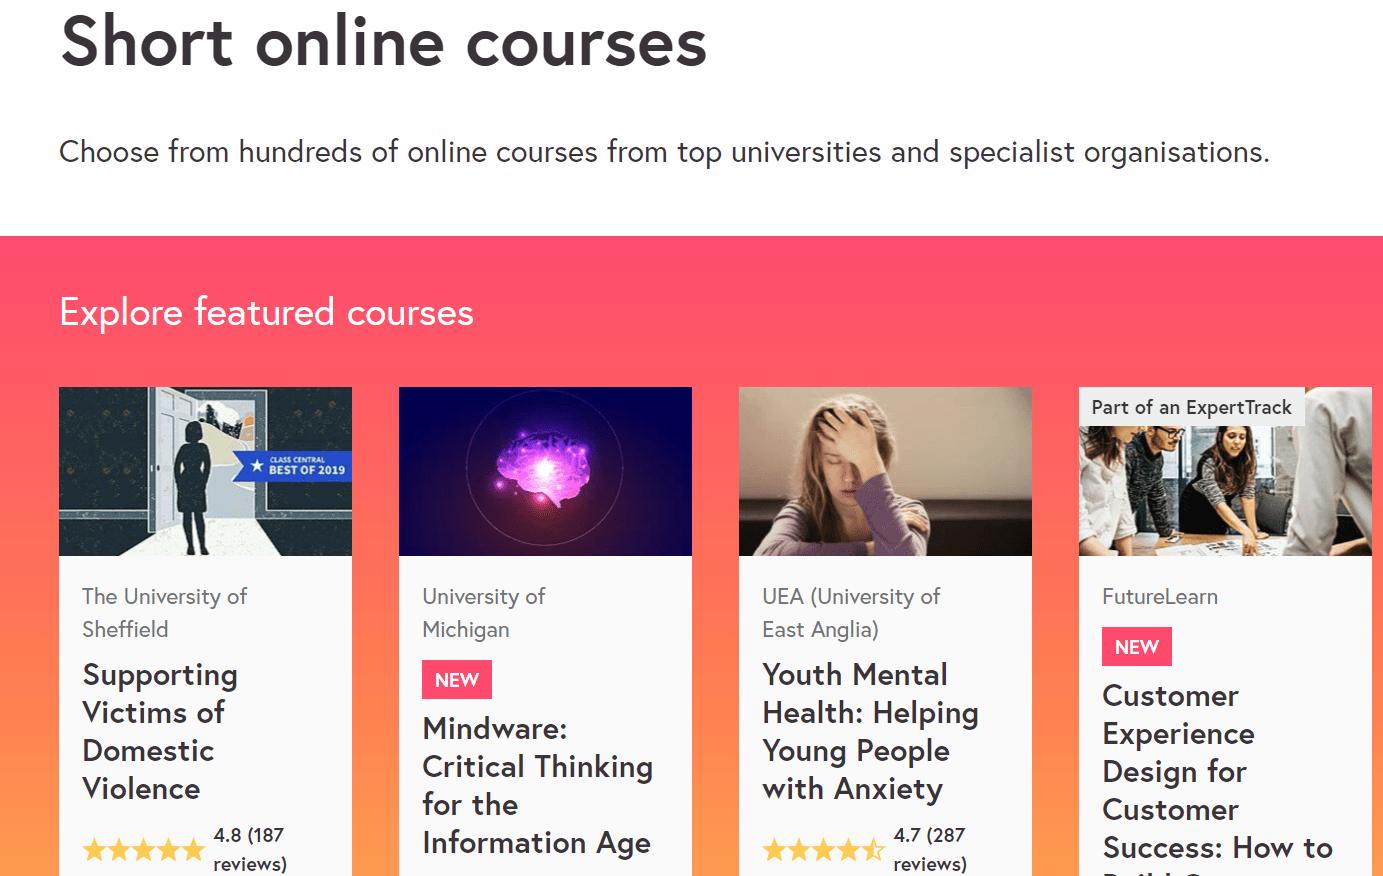 FutureLearn - Short online courses